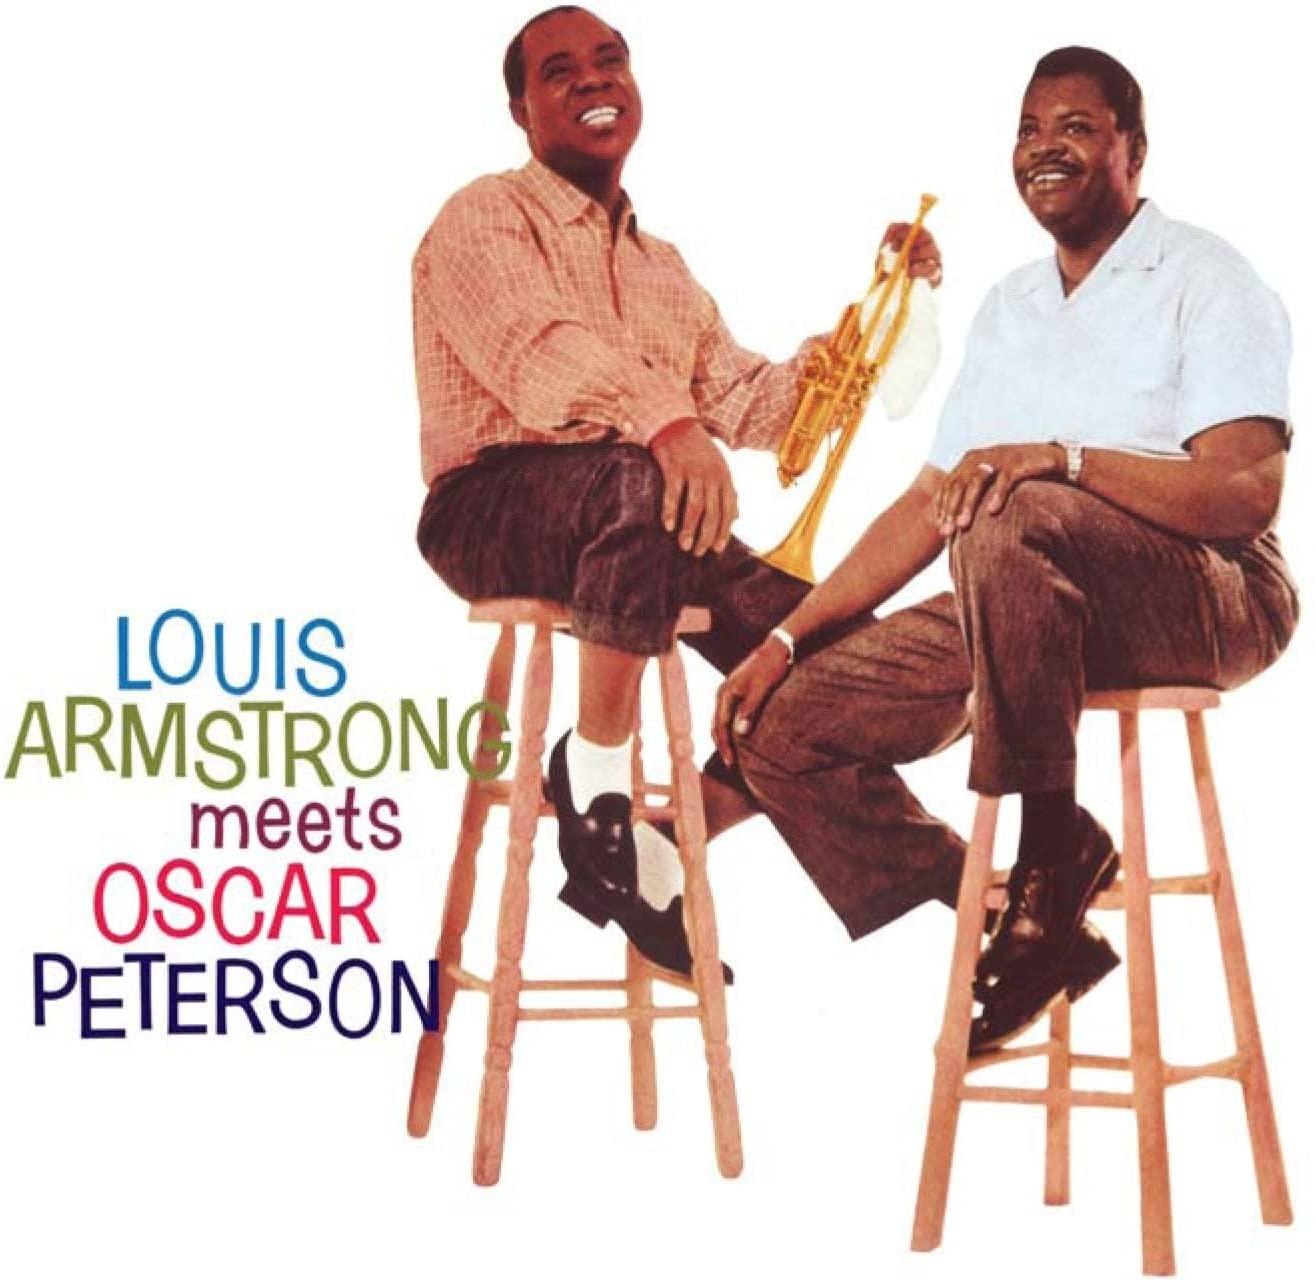 Louis Armstrong & Oscar Peter • Louis Armstrong Meets Oscar Peterson (Acoustic Sounds Series)-1